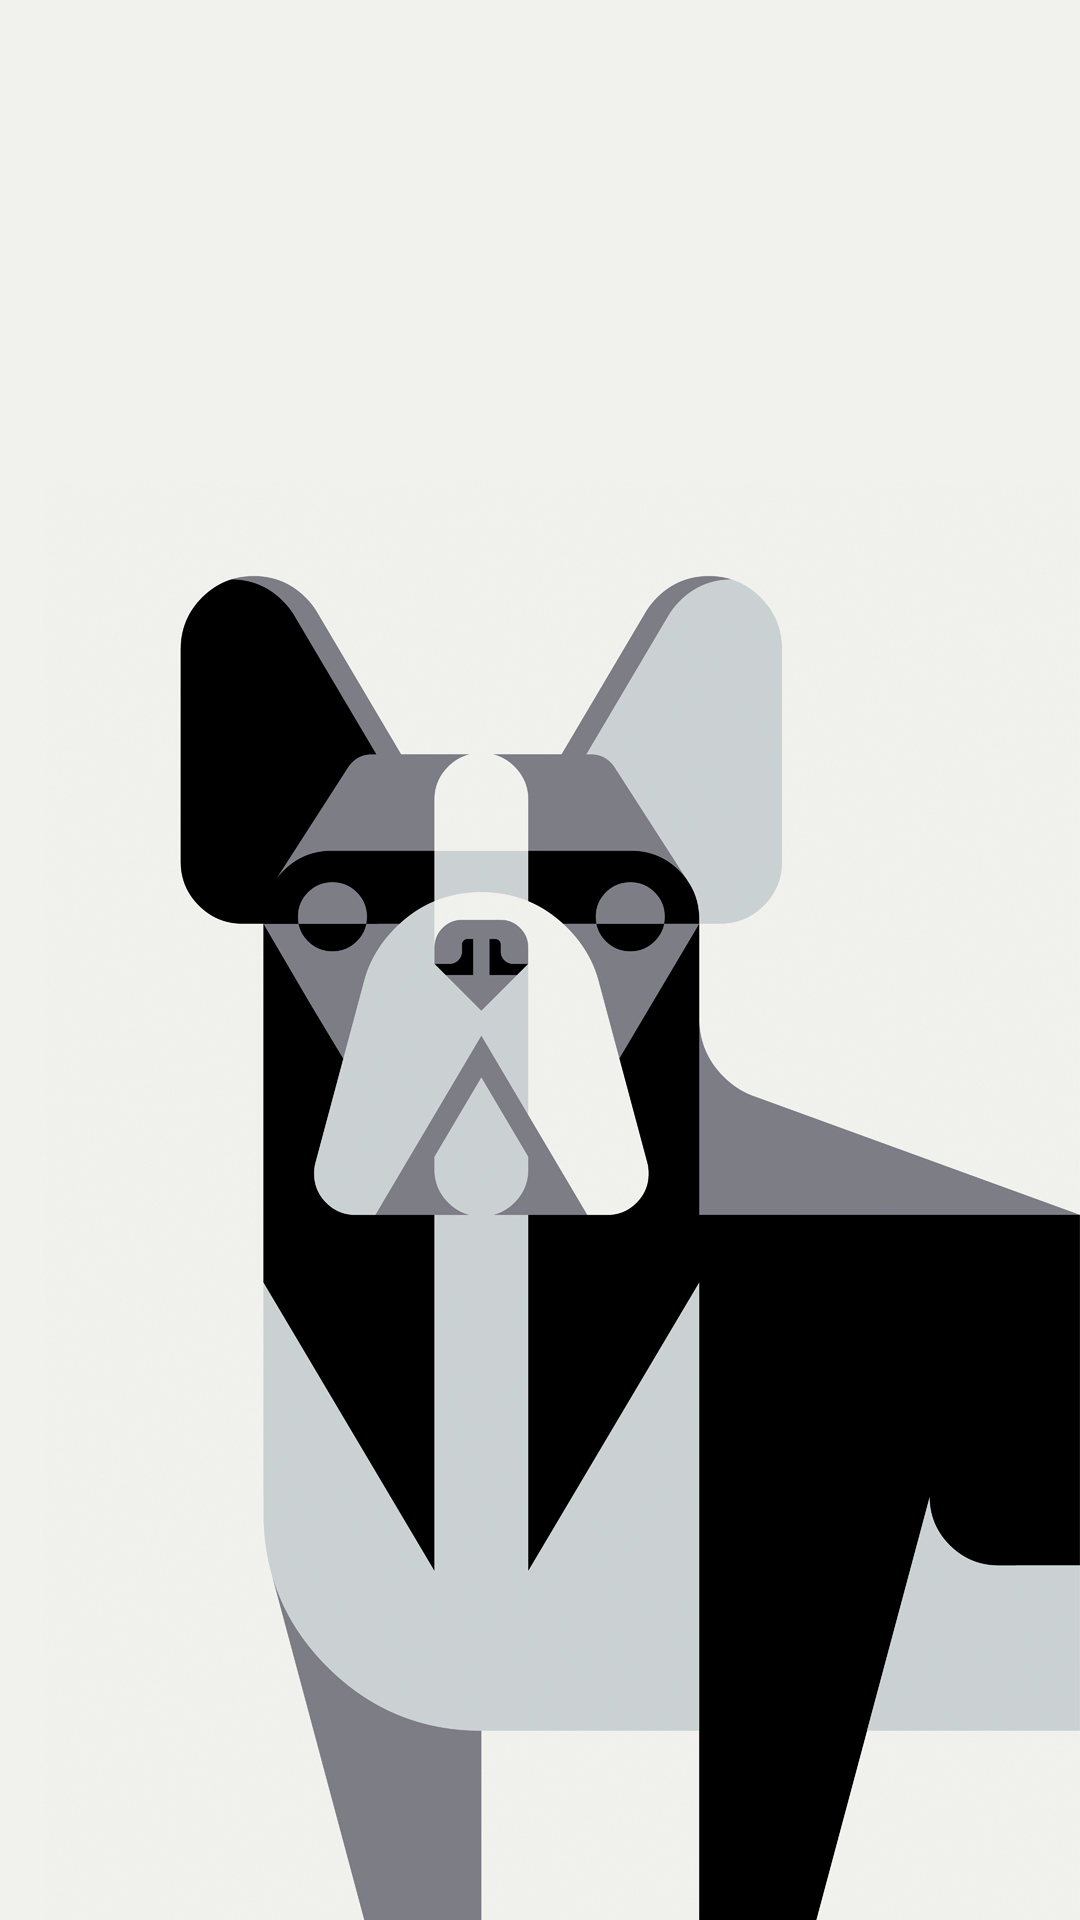 FrenchBulldogPortrait_Wallpaper_JoshBrill.jpg